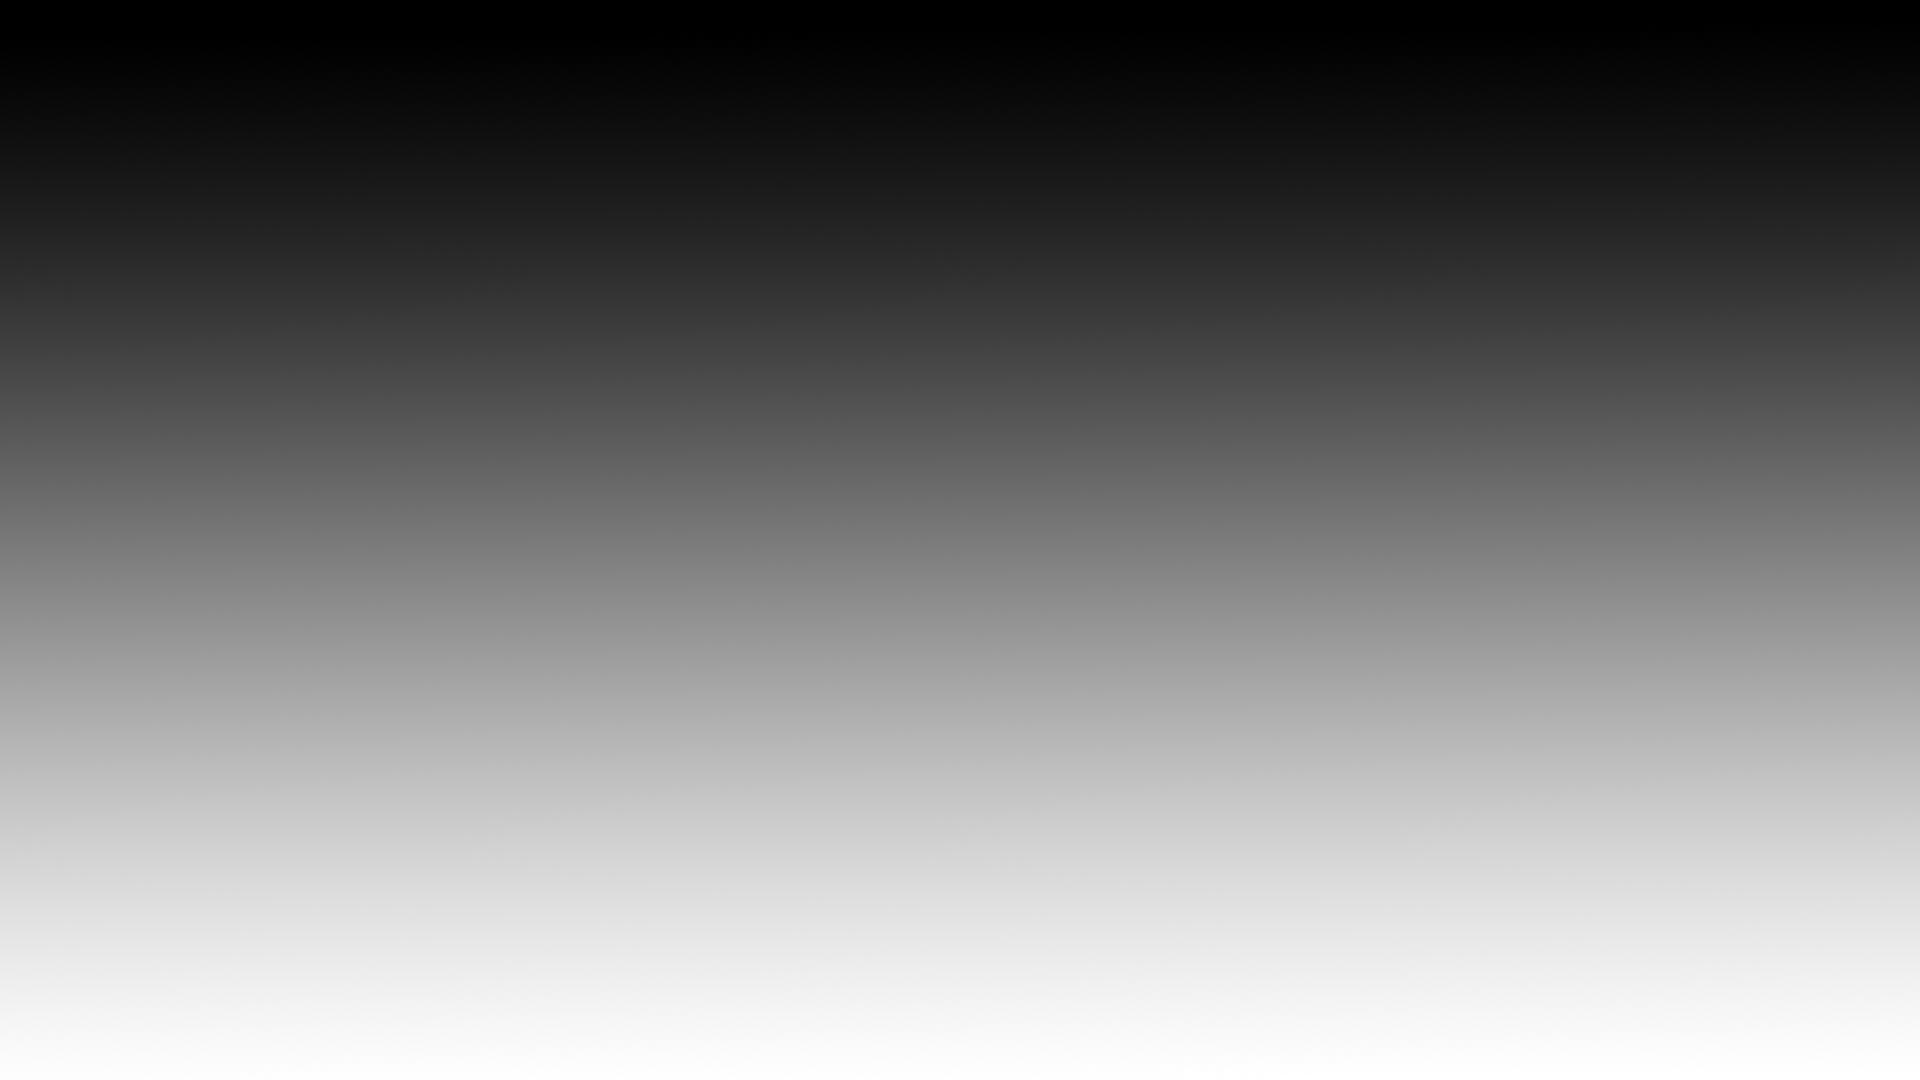 Wallpaper Desktop Black Silver Grant Grey 1920x1080